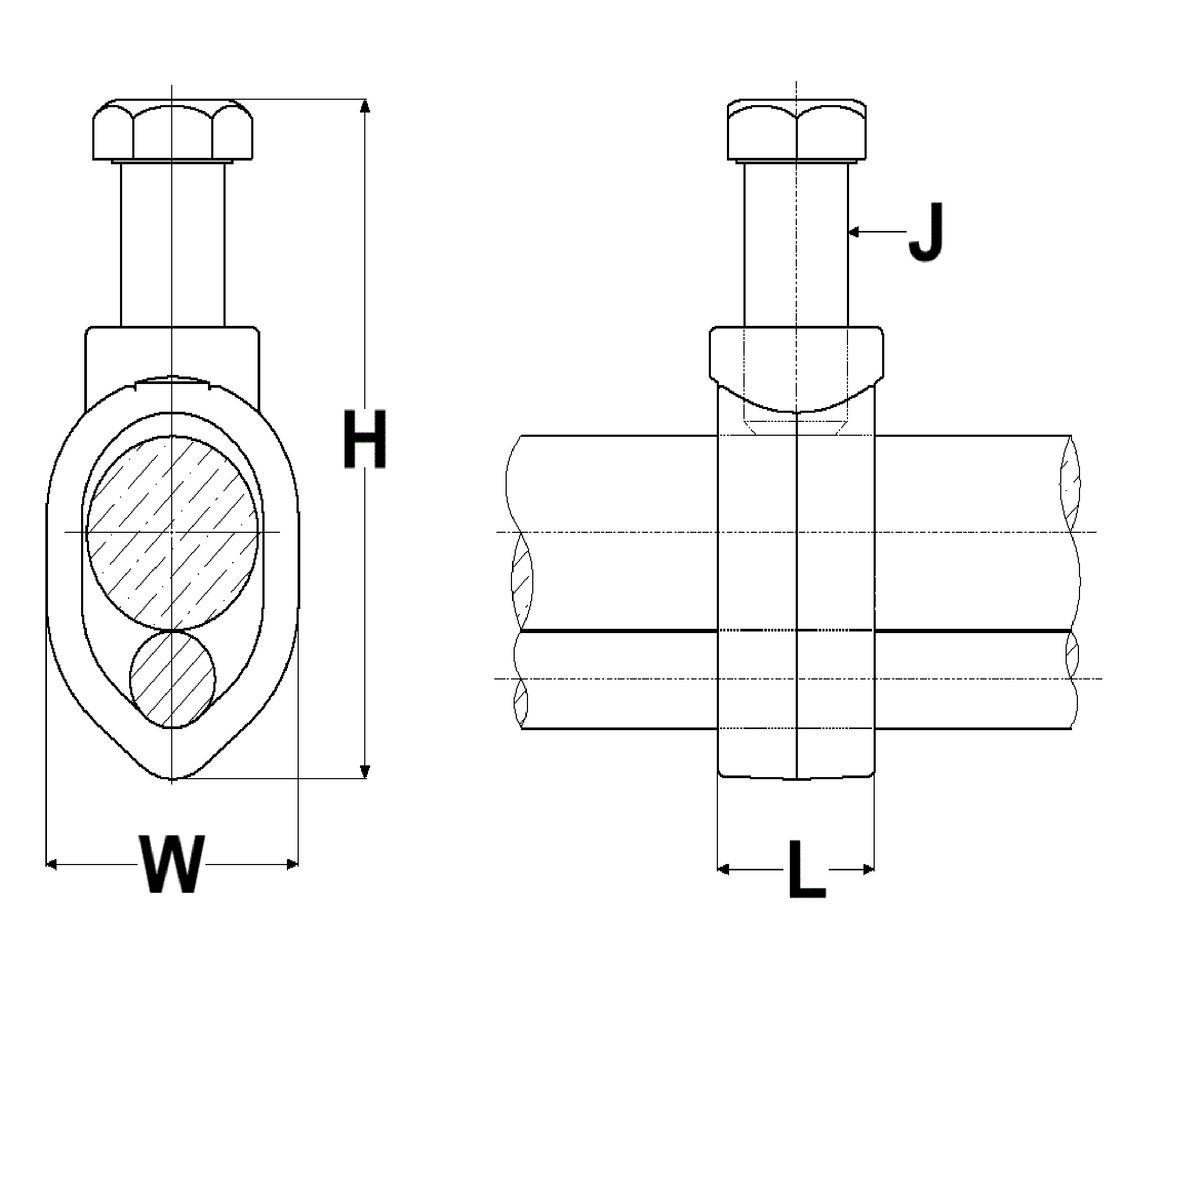 grc3426